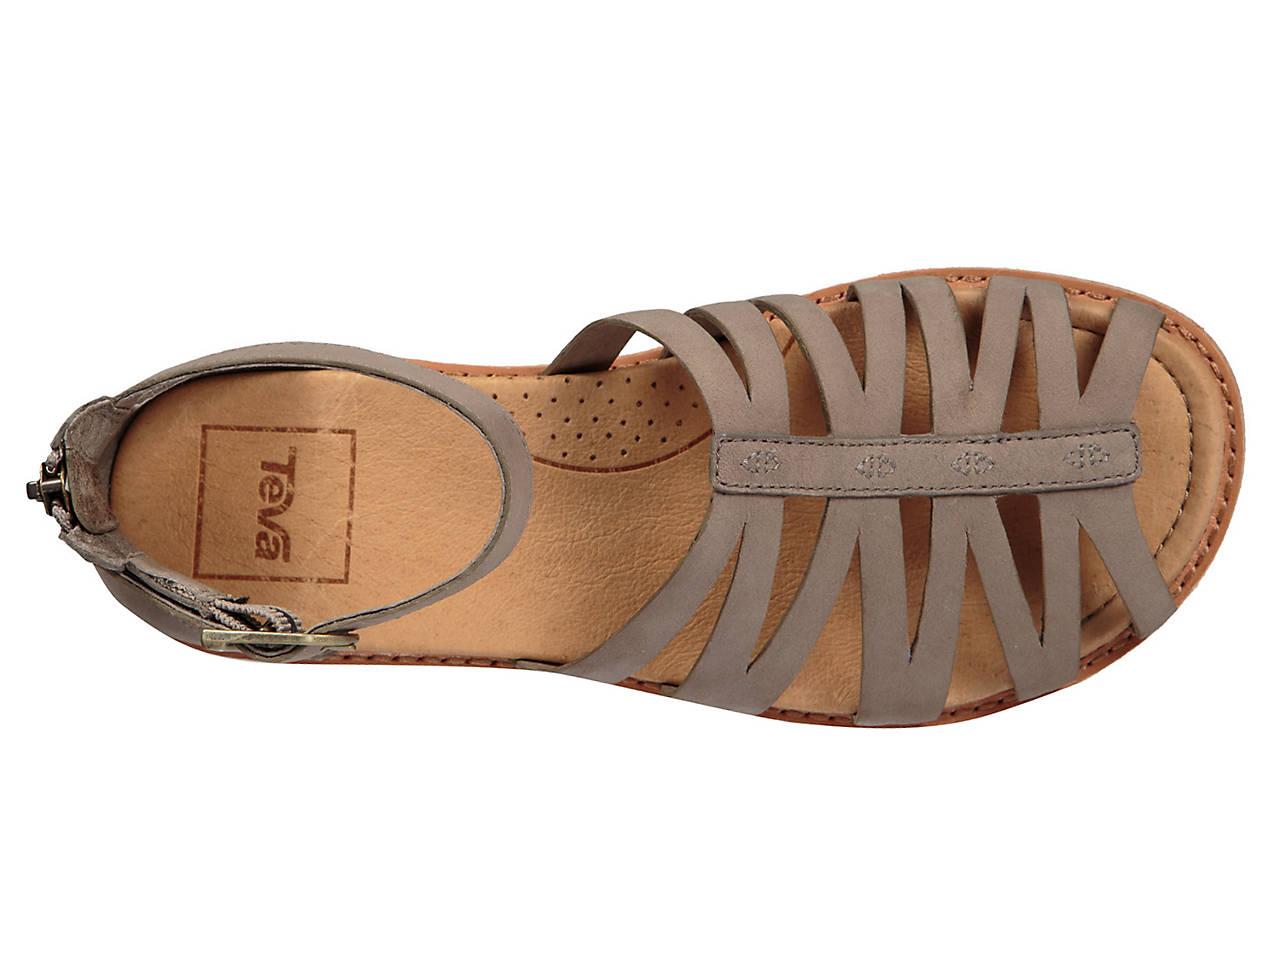 1b07dae2b5f6 Teva Encanta Sandal Women s Shoes